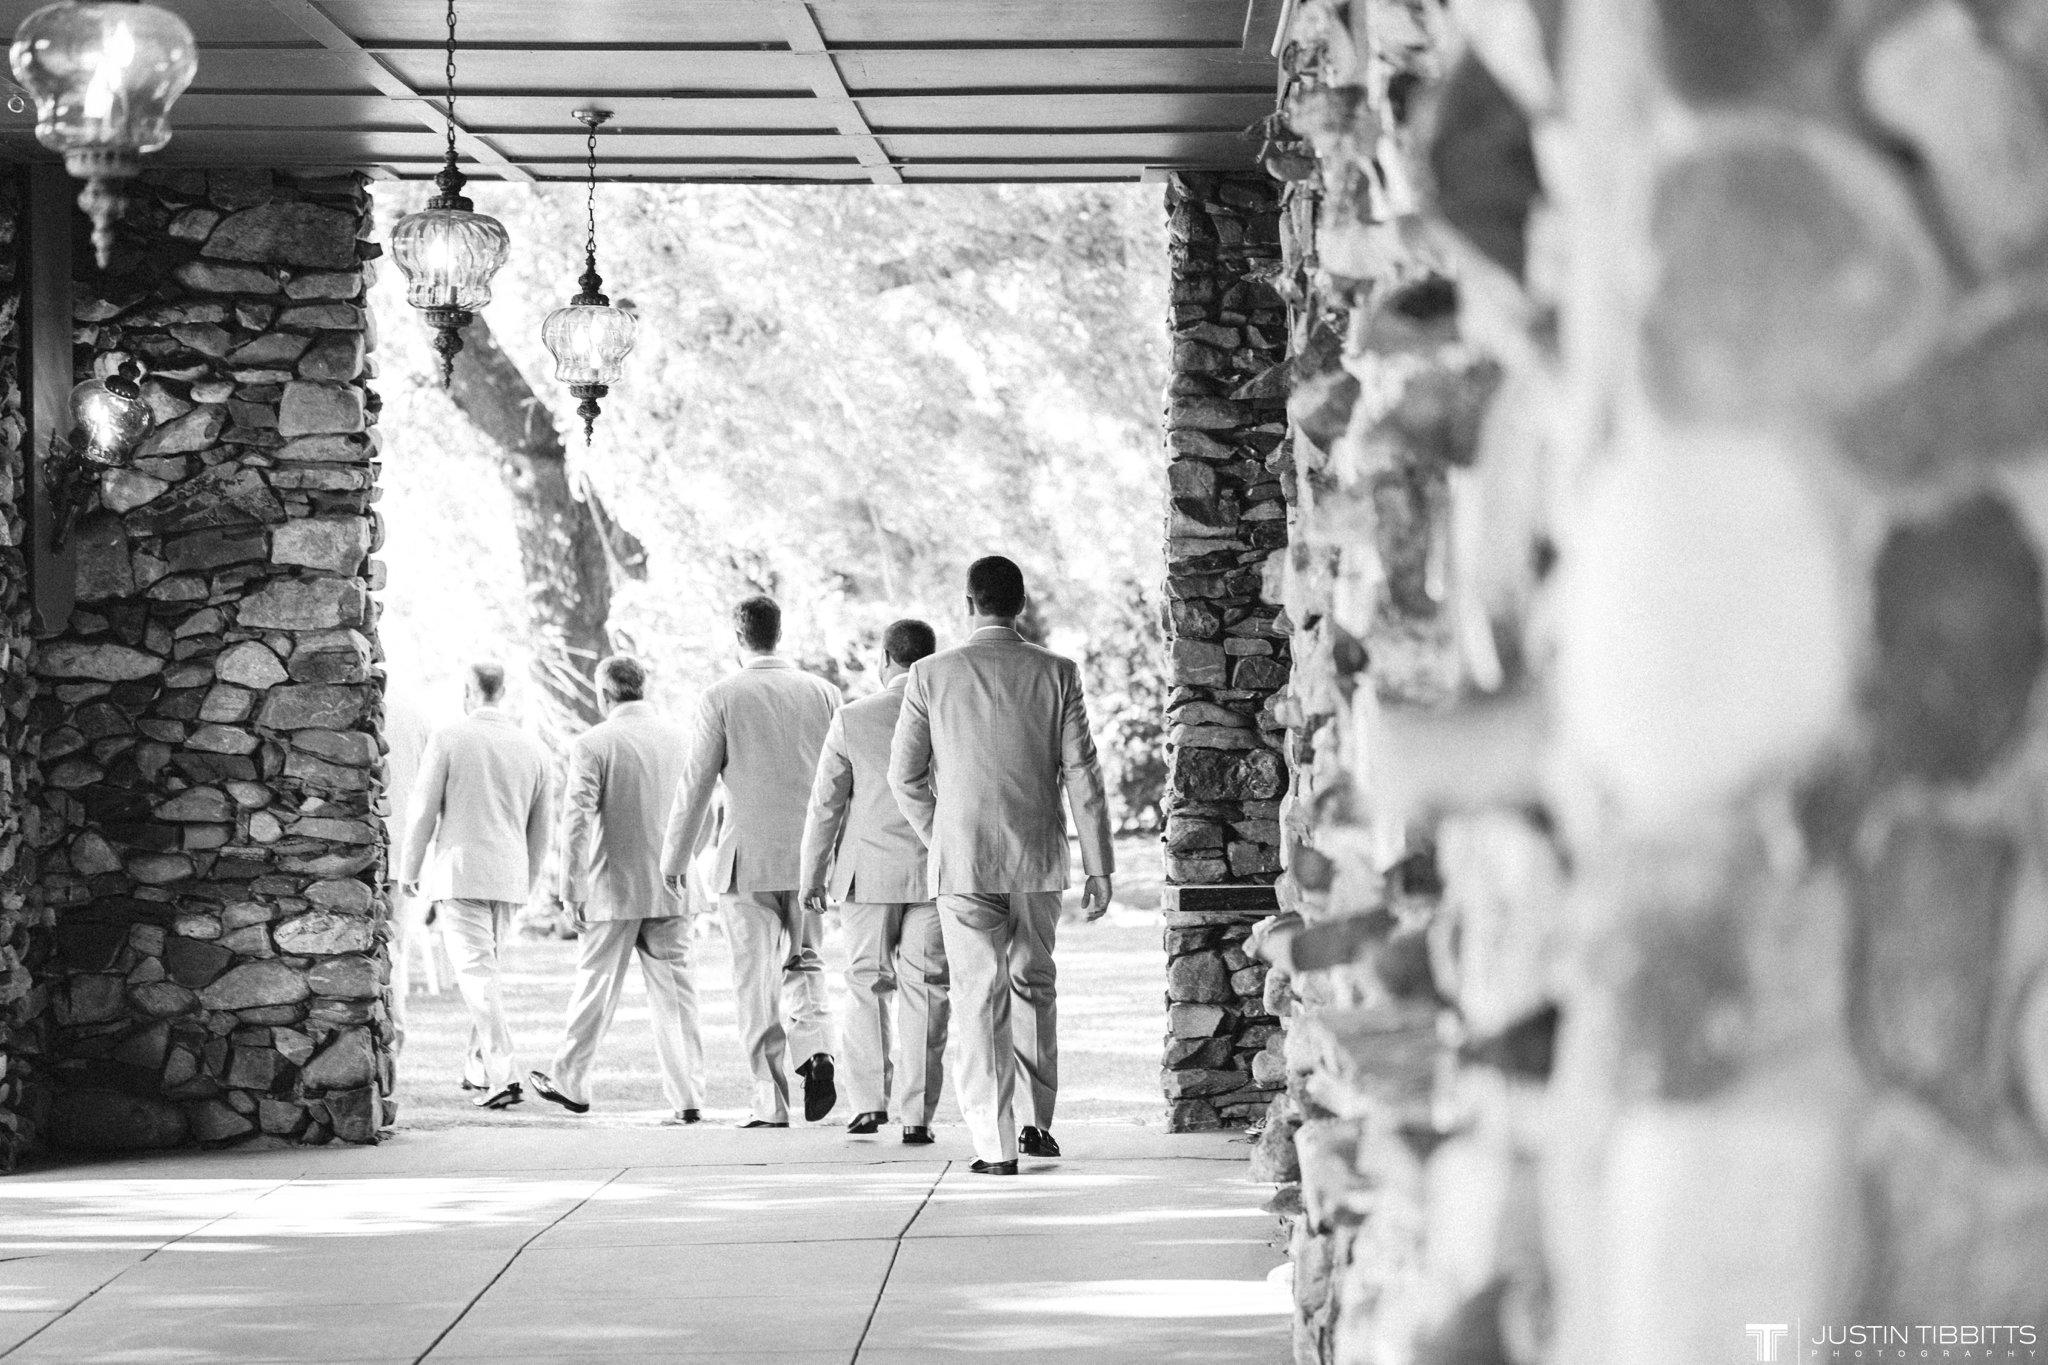 crooked-lake-house-wedding-photos-with-agata-and-seth_0050